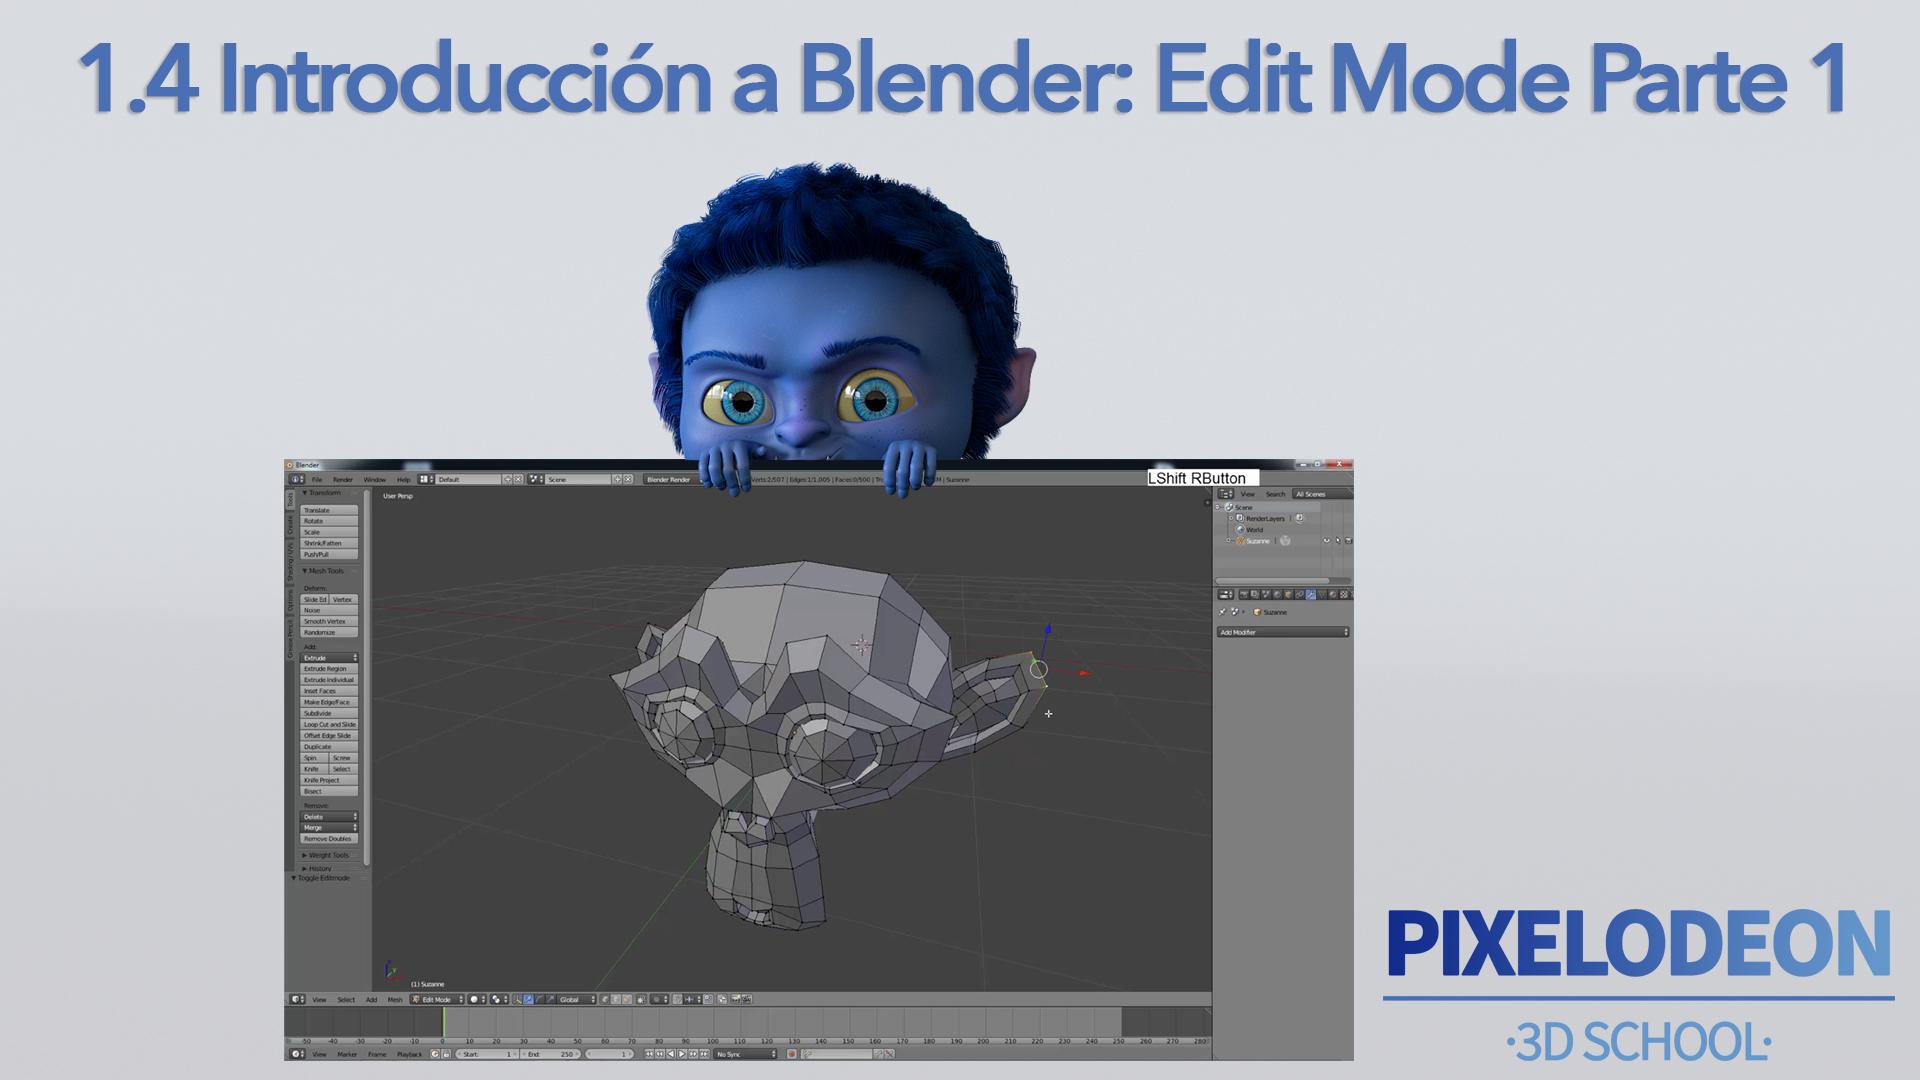 tutorial-1-4-introduccion-a-blender-edit-mode-parte-1